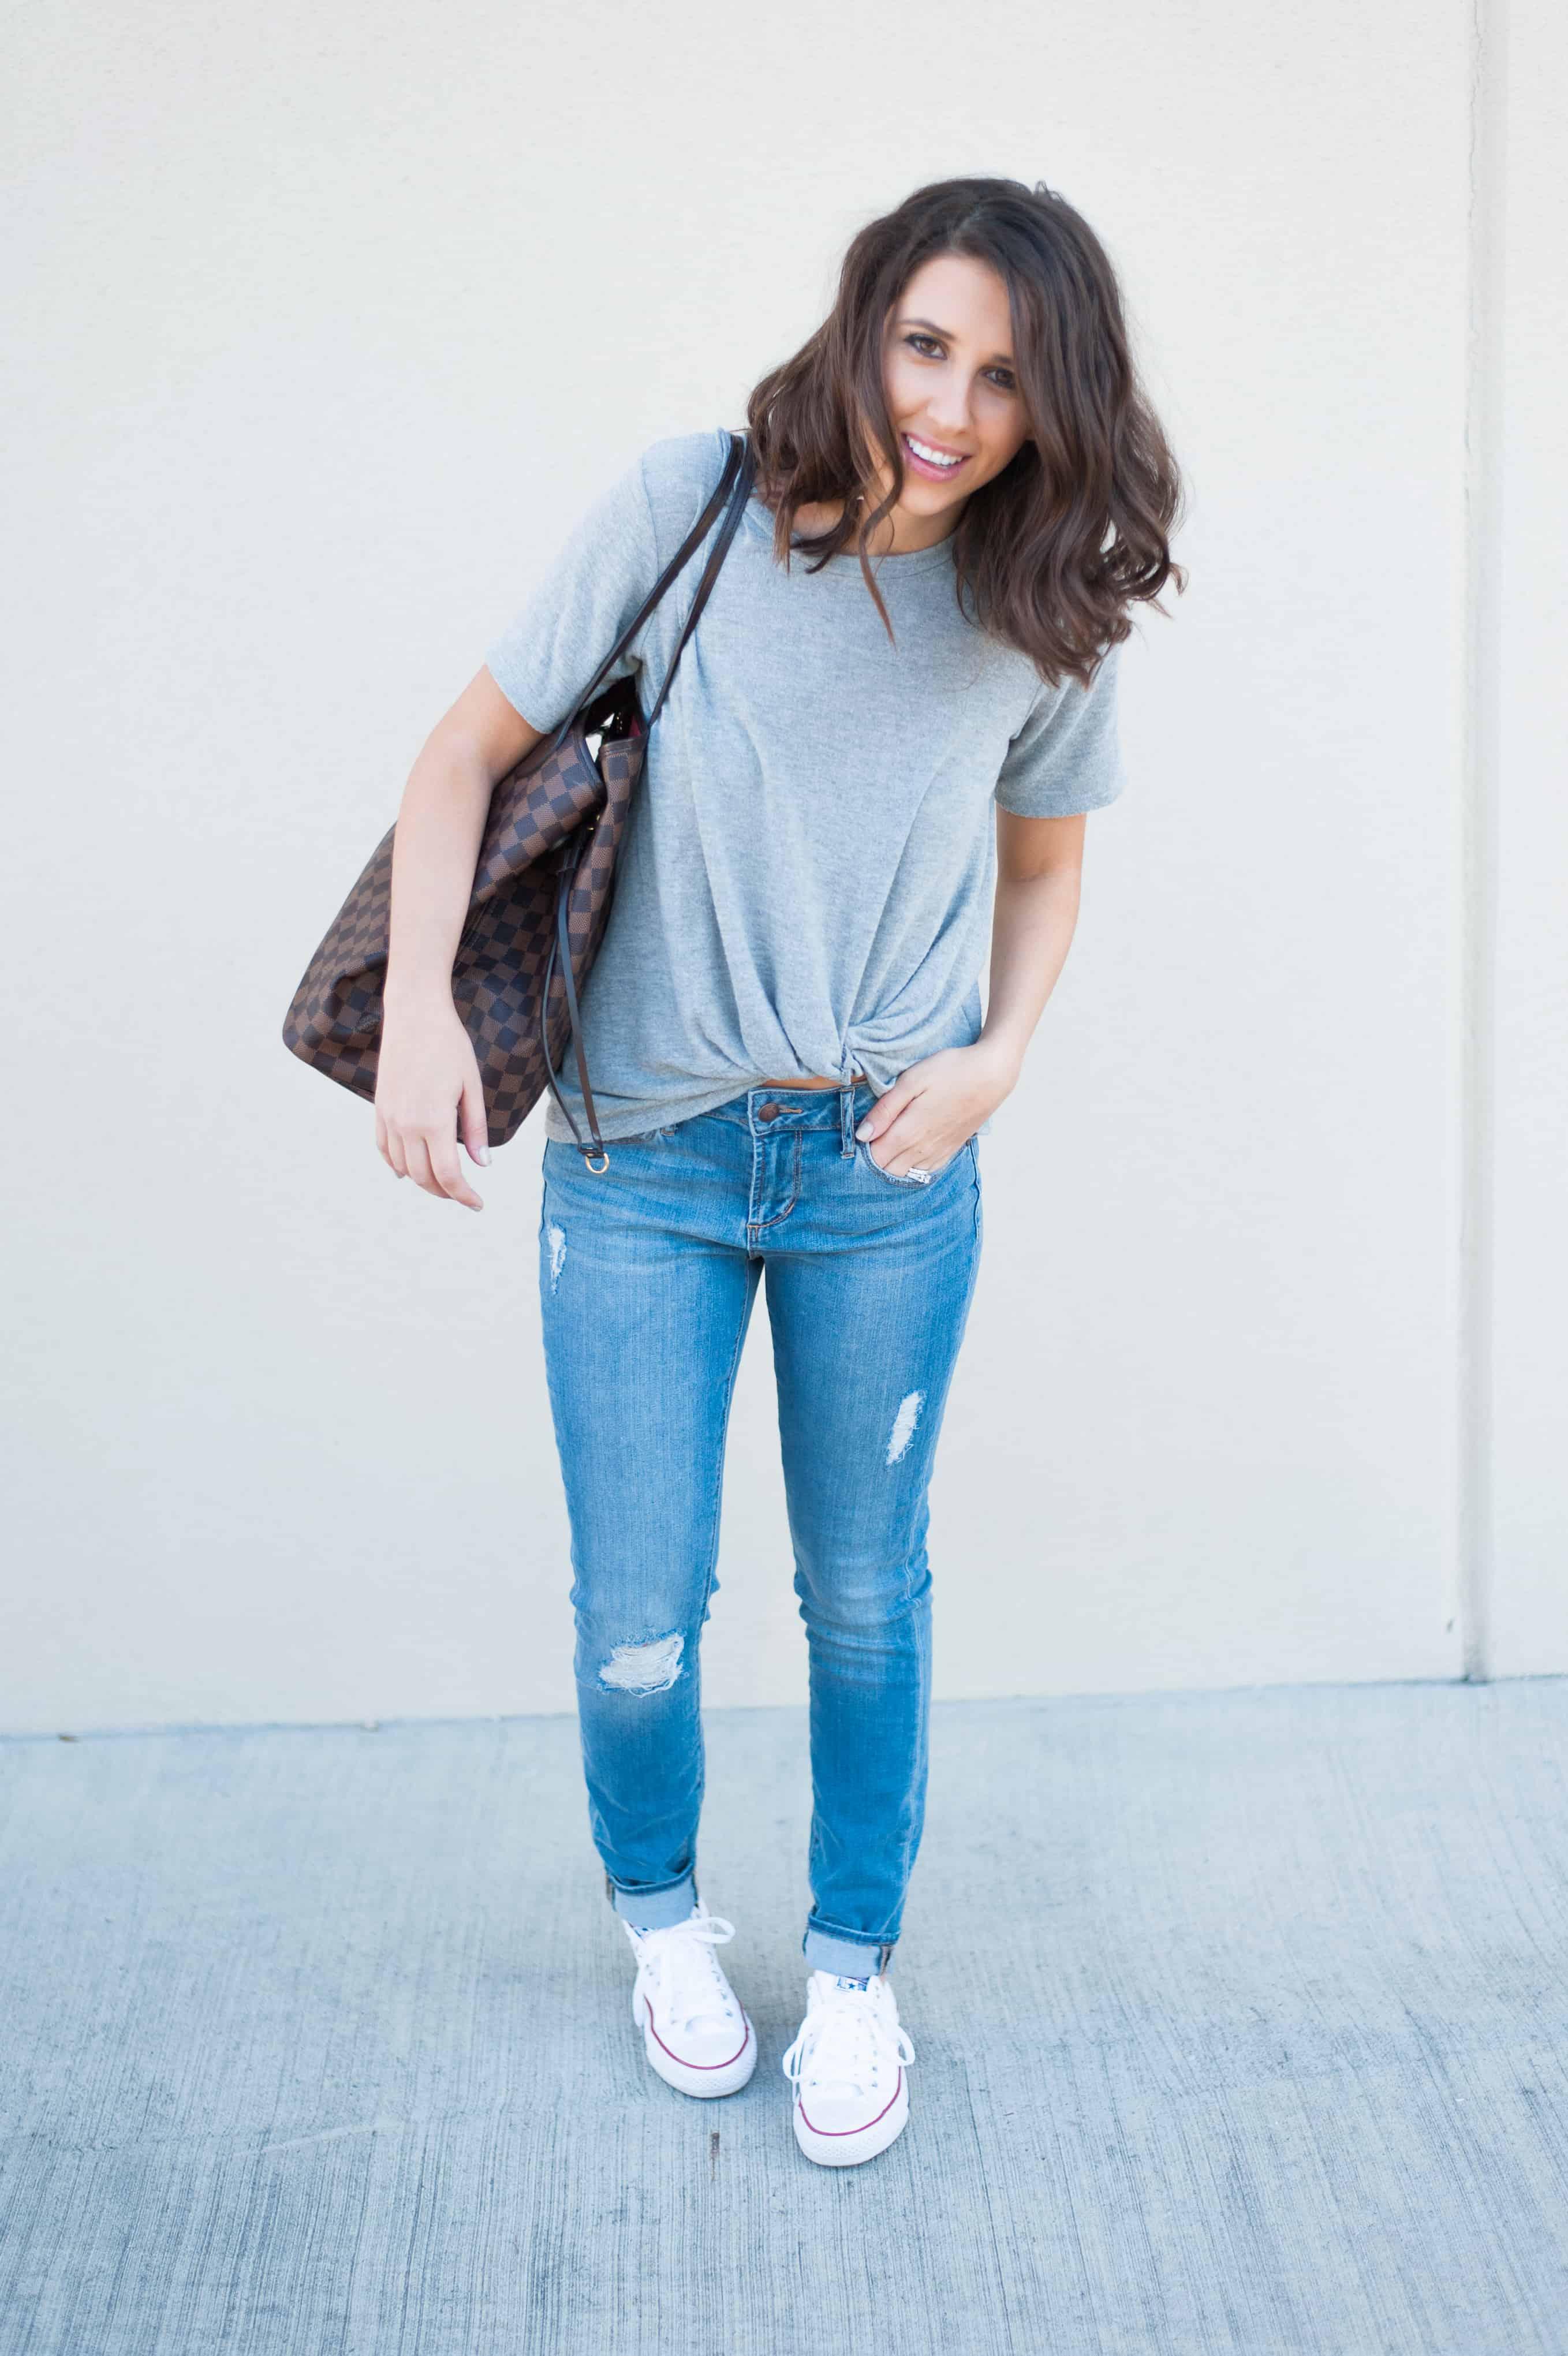 Dress Up Buttercup | Houston Fashion Blog - Dede Raad Knot Tee